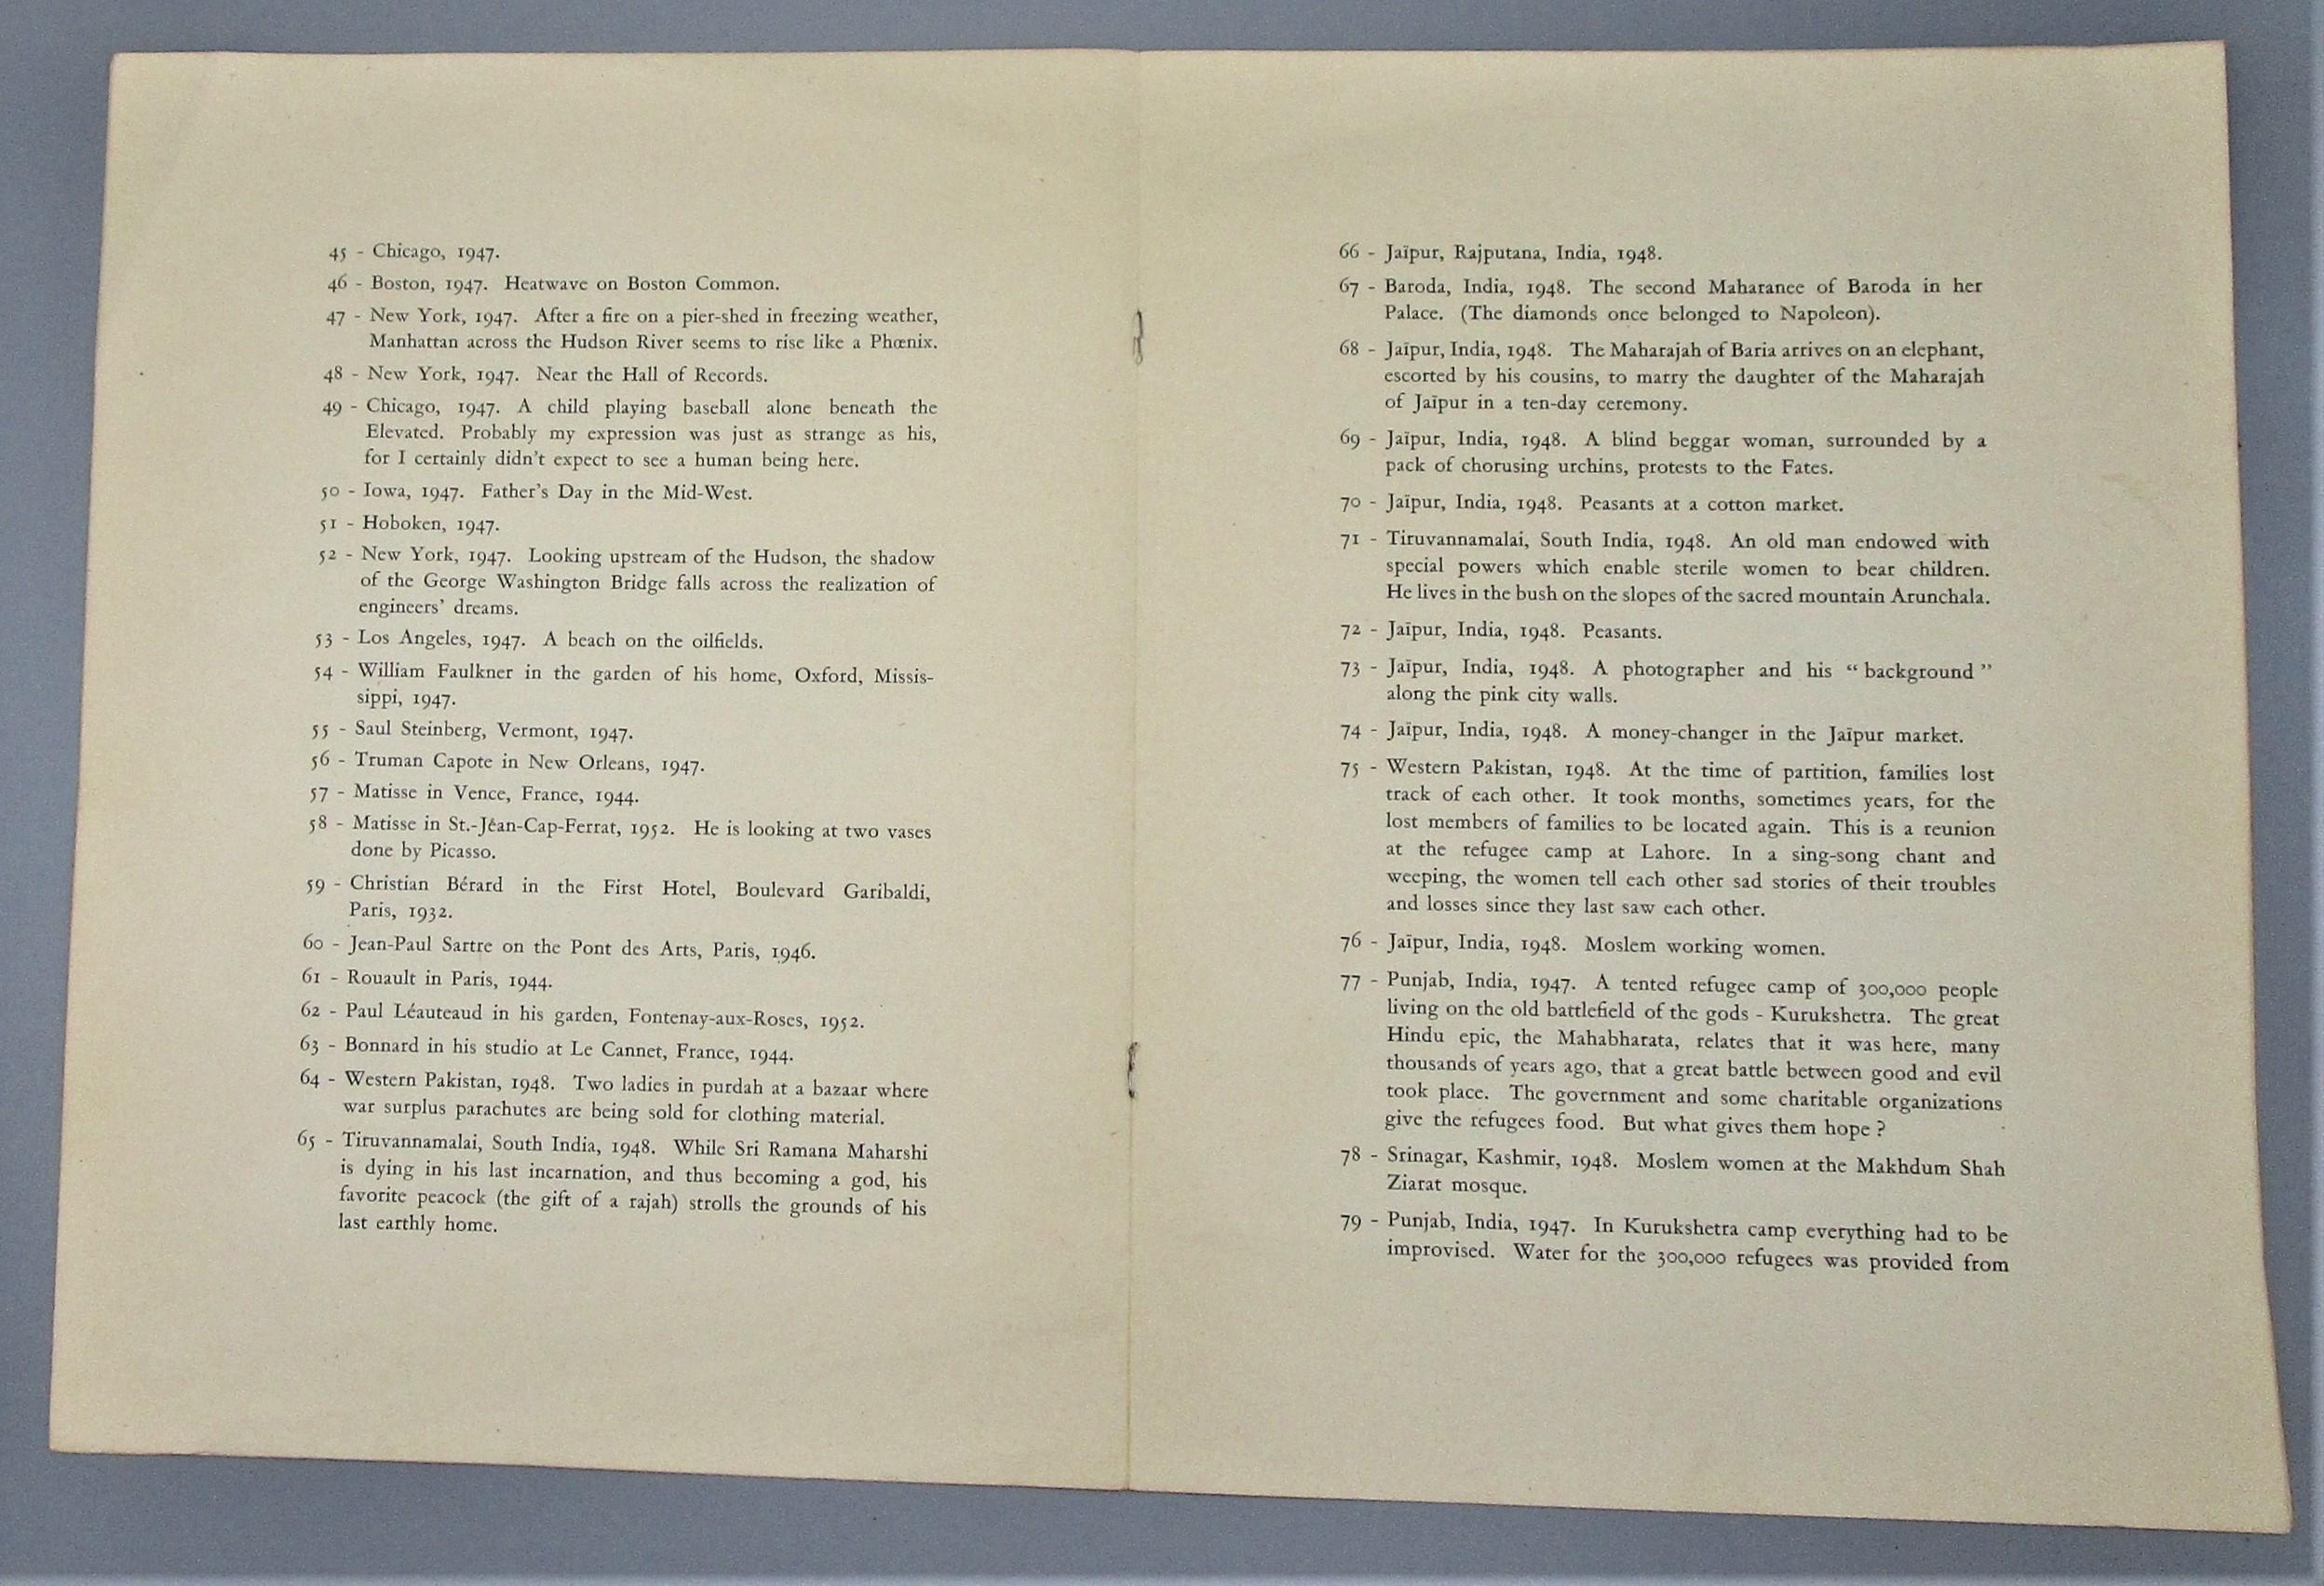 THE DECISIVE MOMENT, by Henri Cartier Bresson - 1952 [1st Ed]